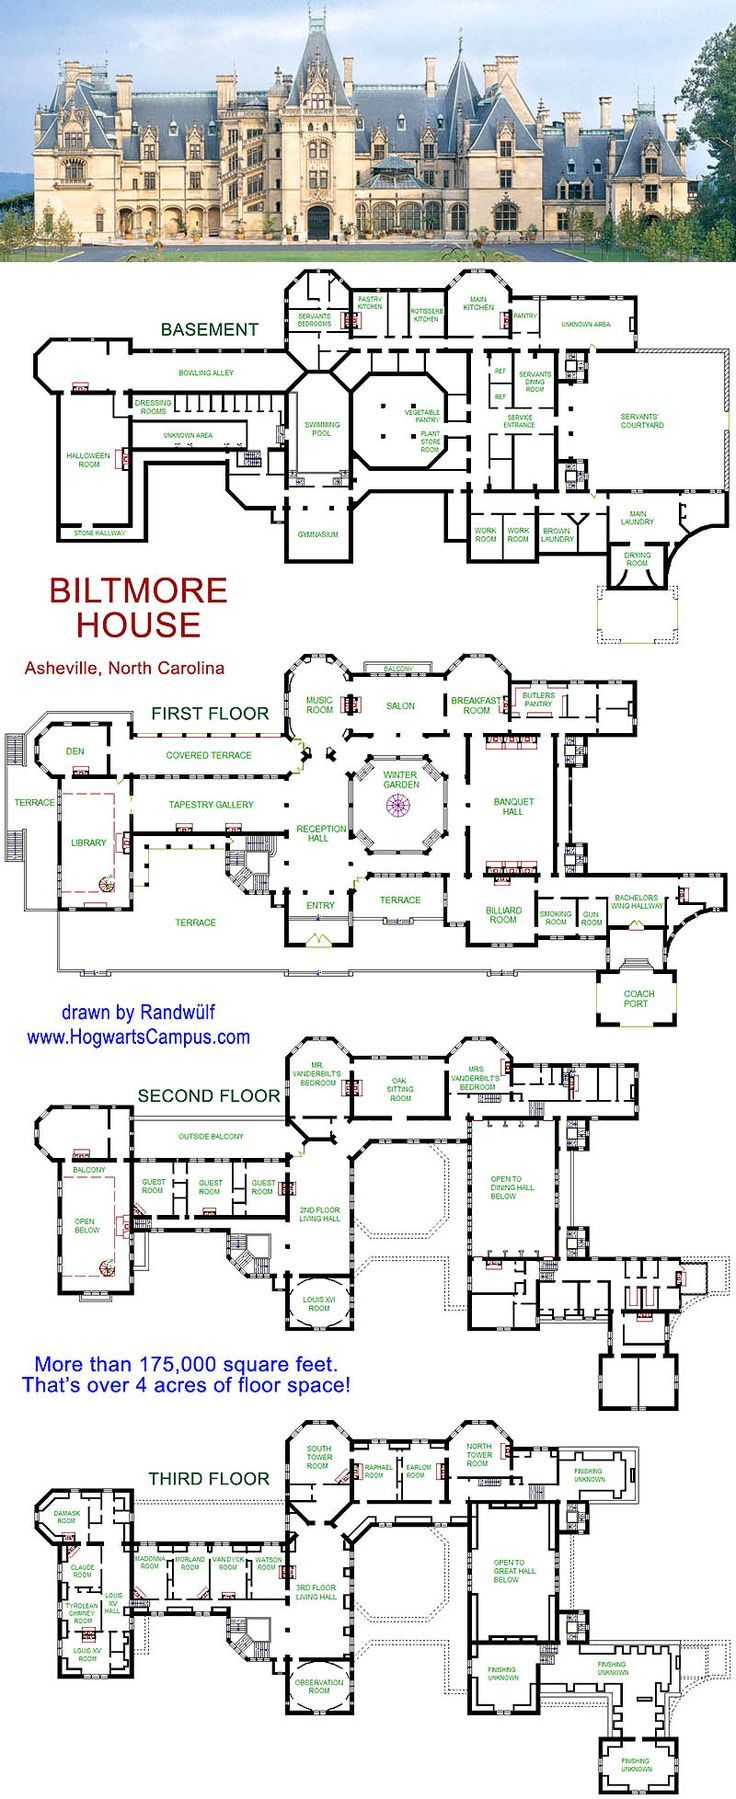 Pin By Skyward Gaze On Castles In 2020 House Plans Mansion Mansion Floor Plan Castle House Plans